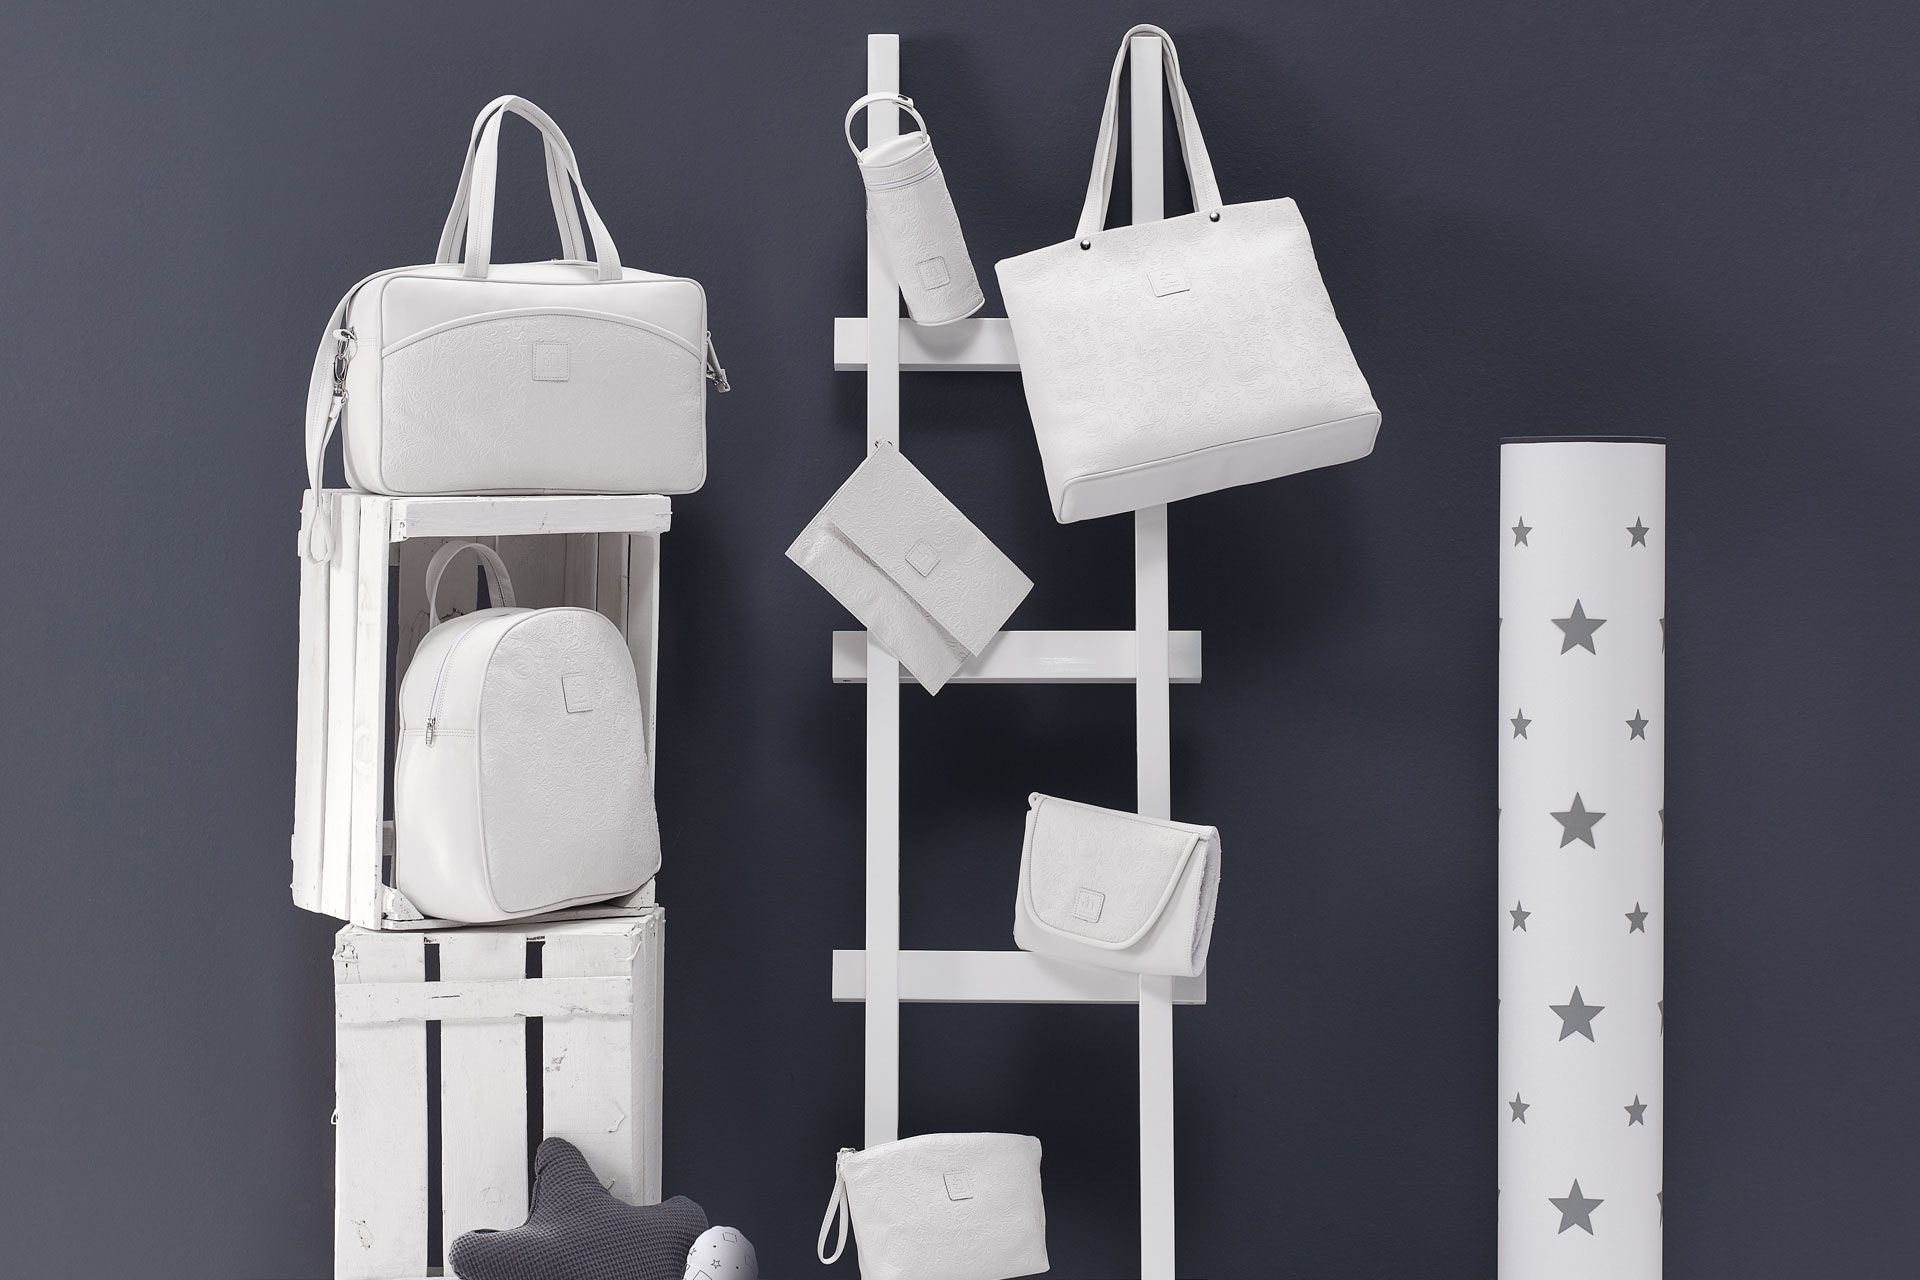 Urban bags - Barocco collection